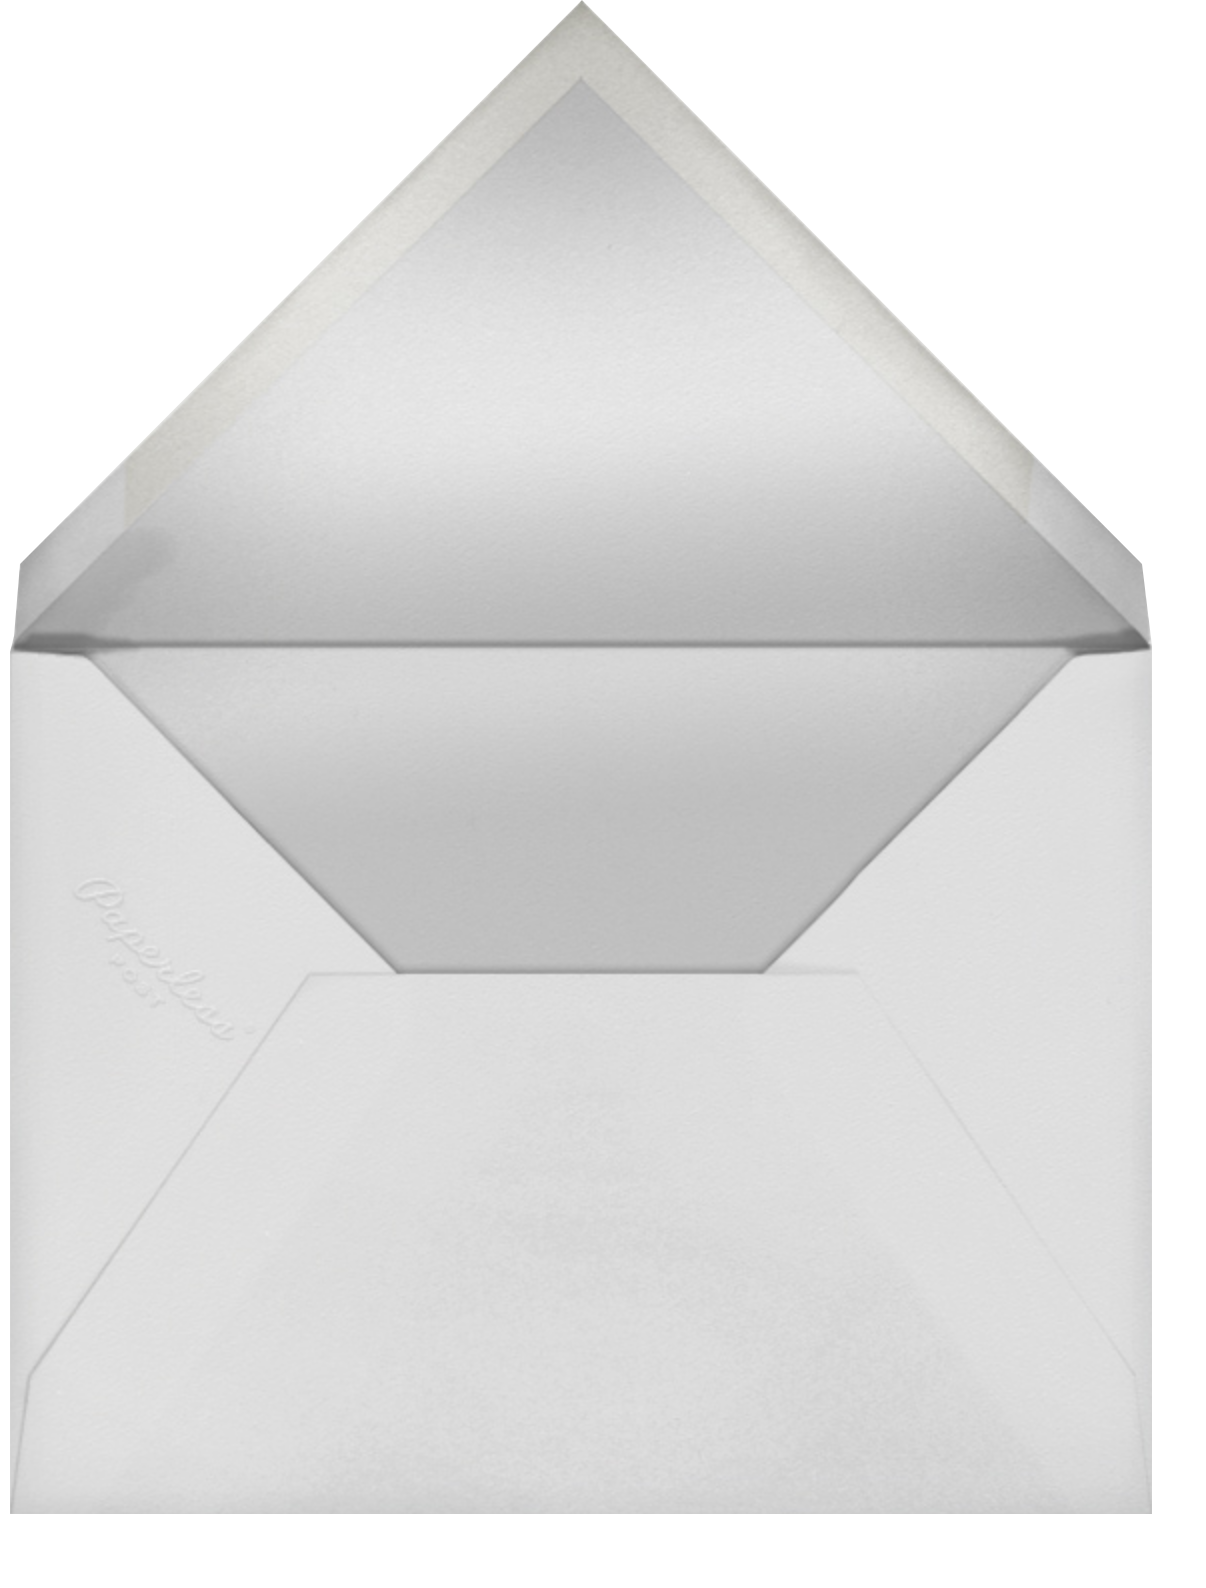 Lodden (Menu) - Pink - Liberty - Menus - envelope back